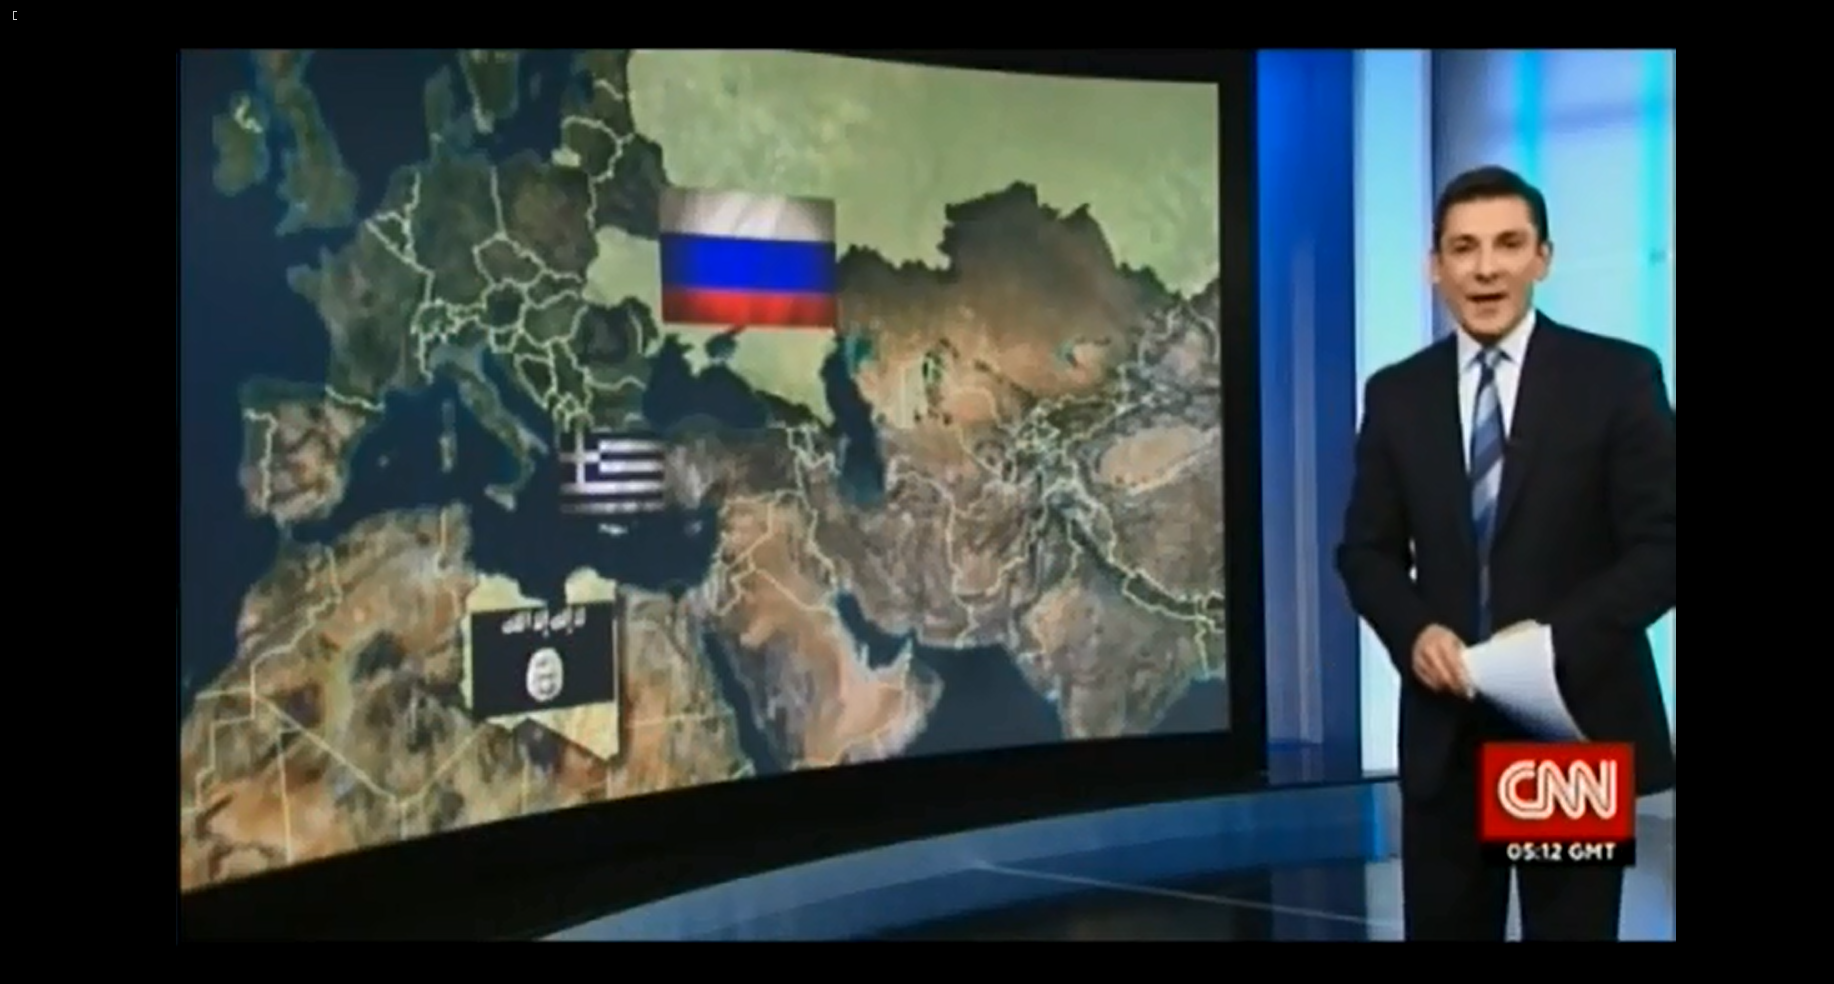 Top 10 des bourdes embarrassantes de CNN (VIDEO)